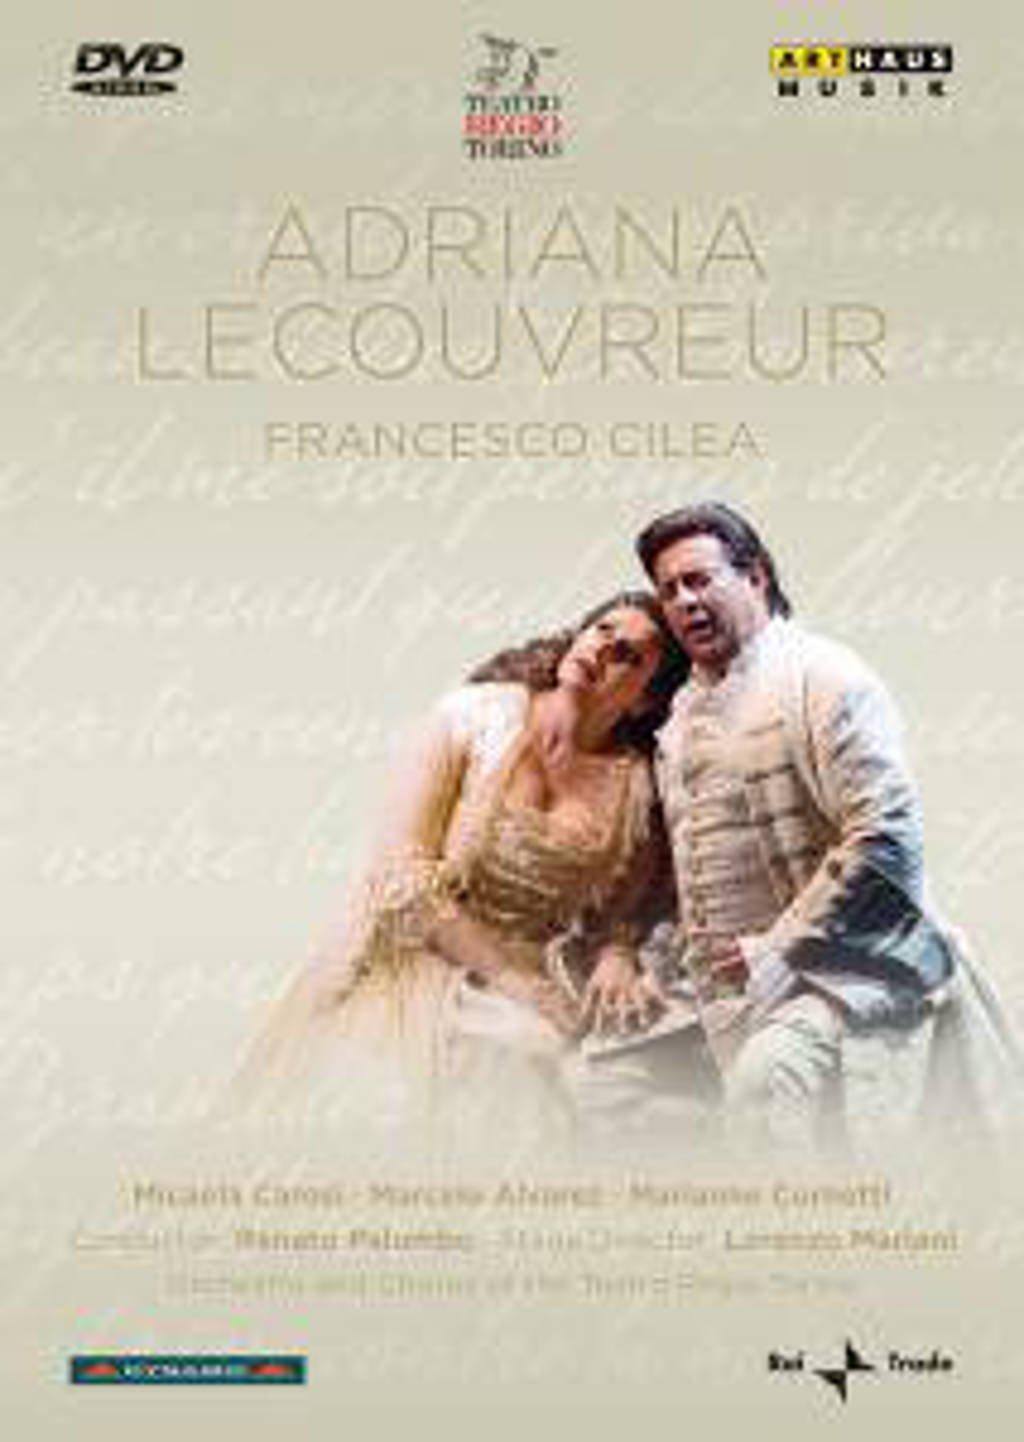 Marcelo Alvarez,Carosi,Cornetti - Adriana Lecouvreur,Turijn 2009 (DVD)